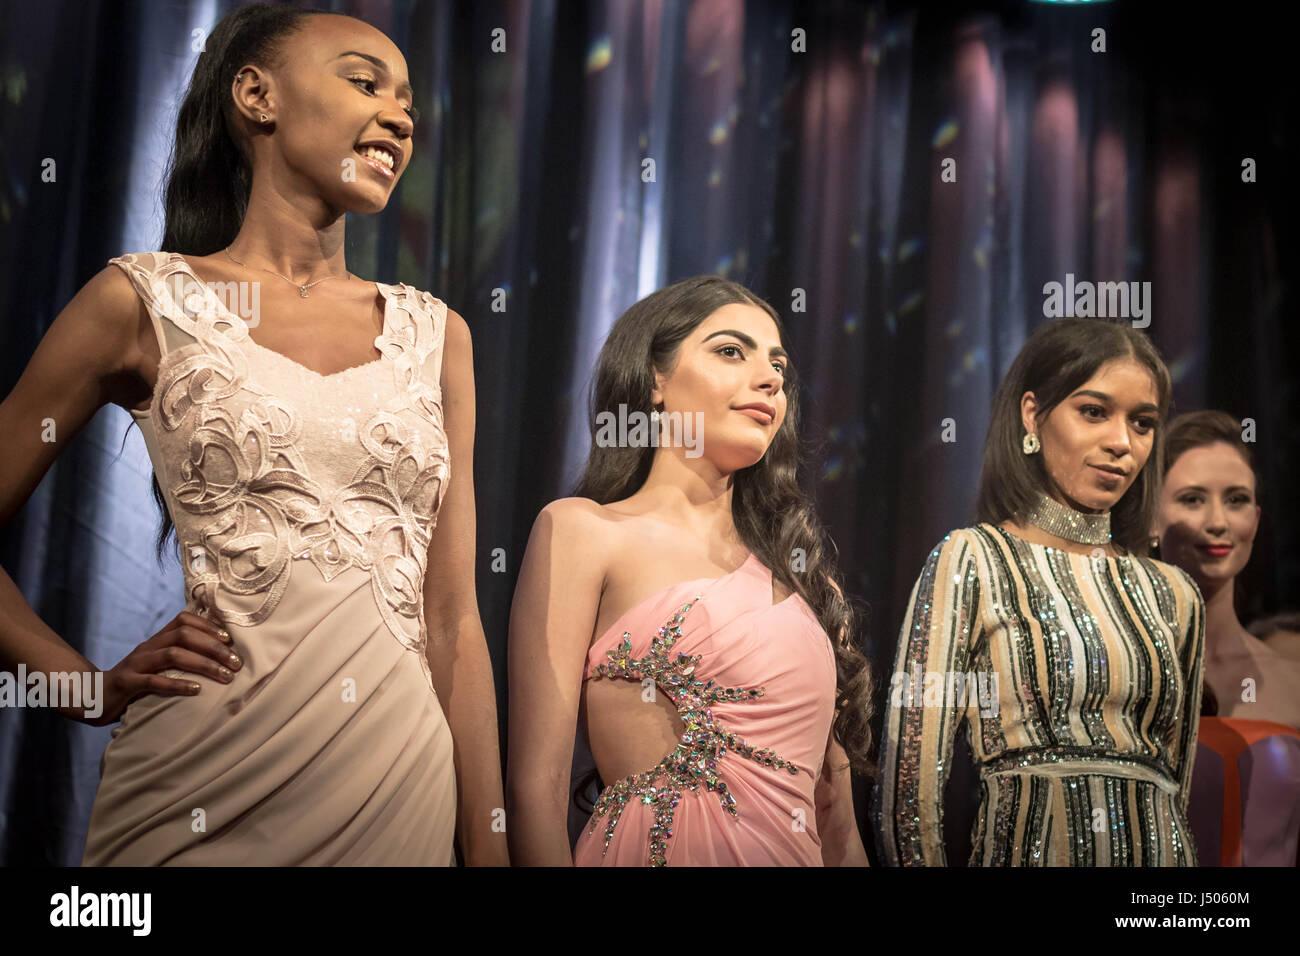 London, UK. 12th May, 2017. Miss London 2017 Finale © Guy Corbishley/Alamy Live News Stock Photo